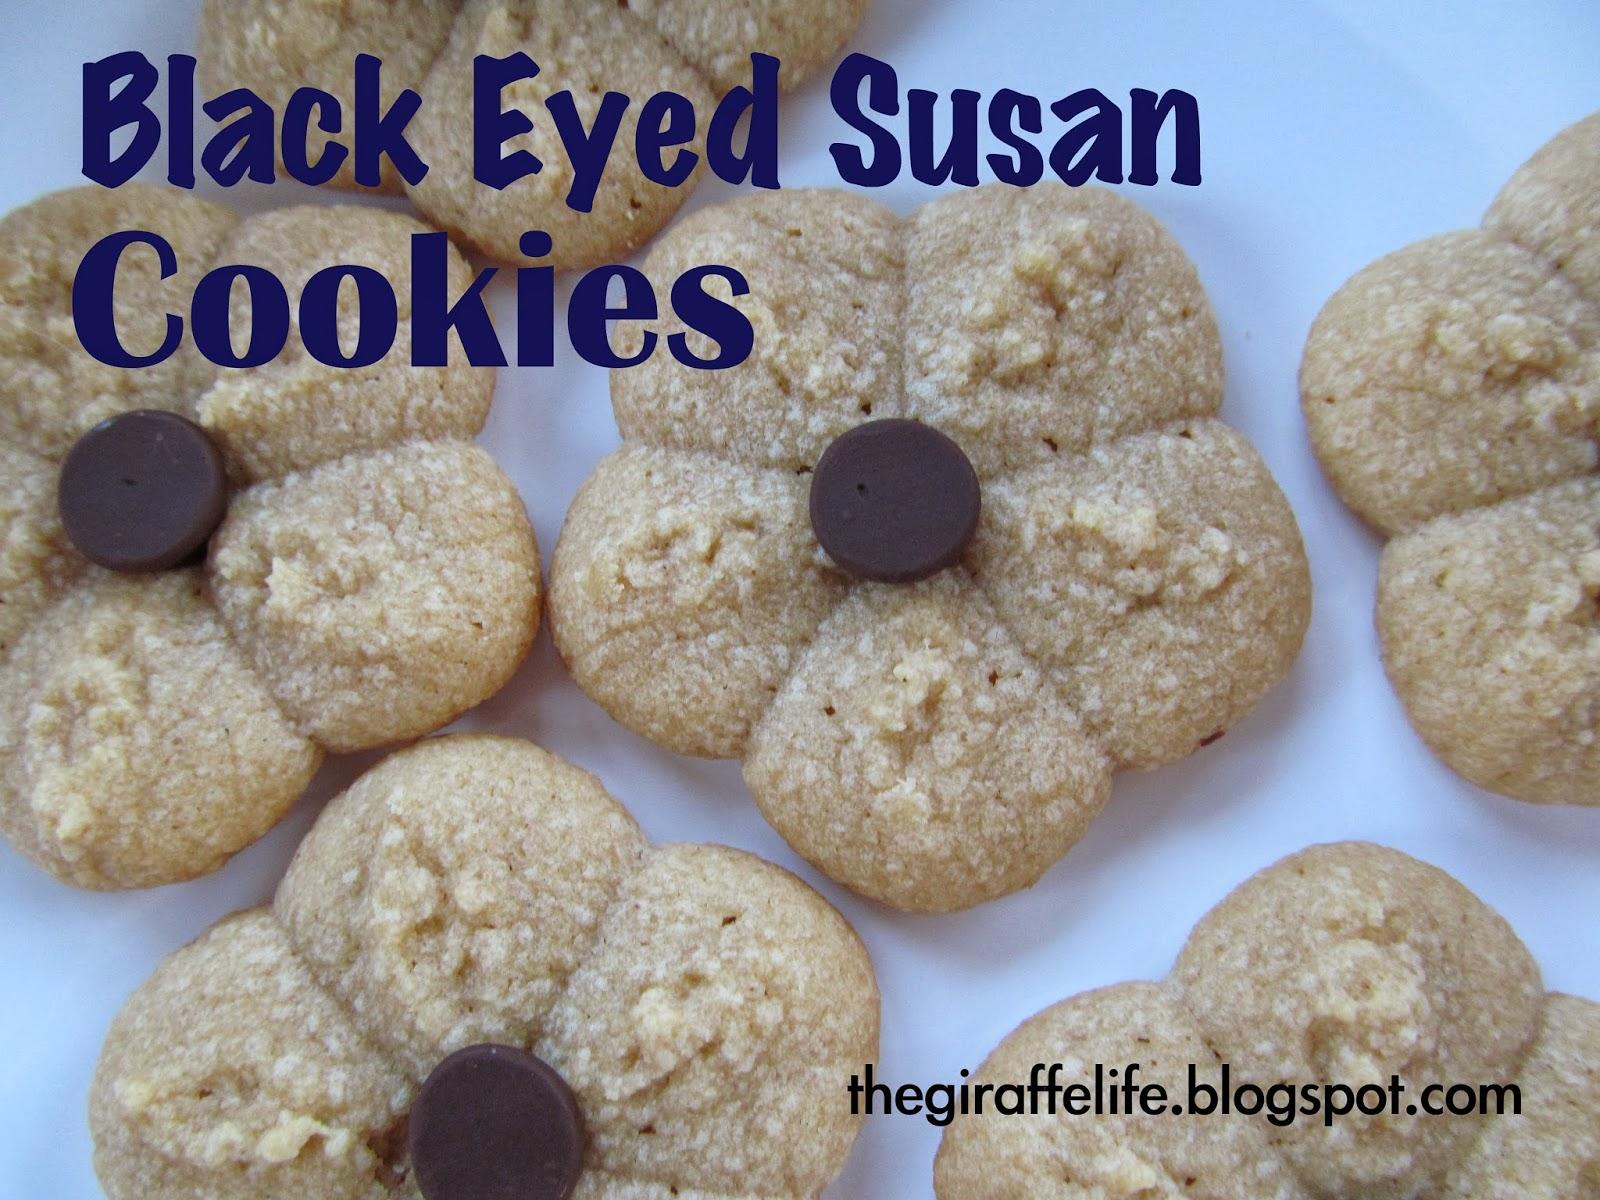 http://2.bp.blogspot.com/-bV_WNGQHPvQ/Uq4SxTI9RbI/AAAAAAAABu4/HXaIn8n1eTw/s1600/black+eyed+susan+cookies.JPG